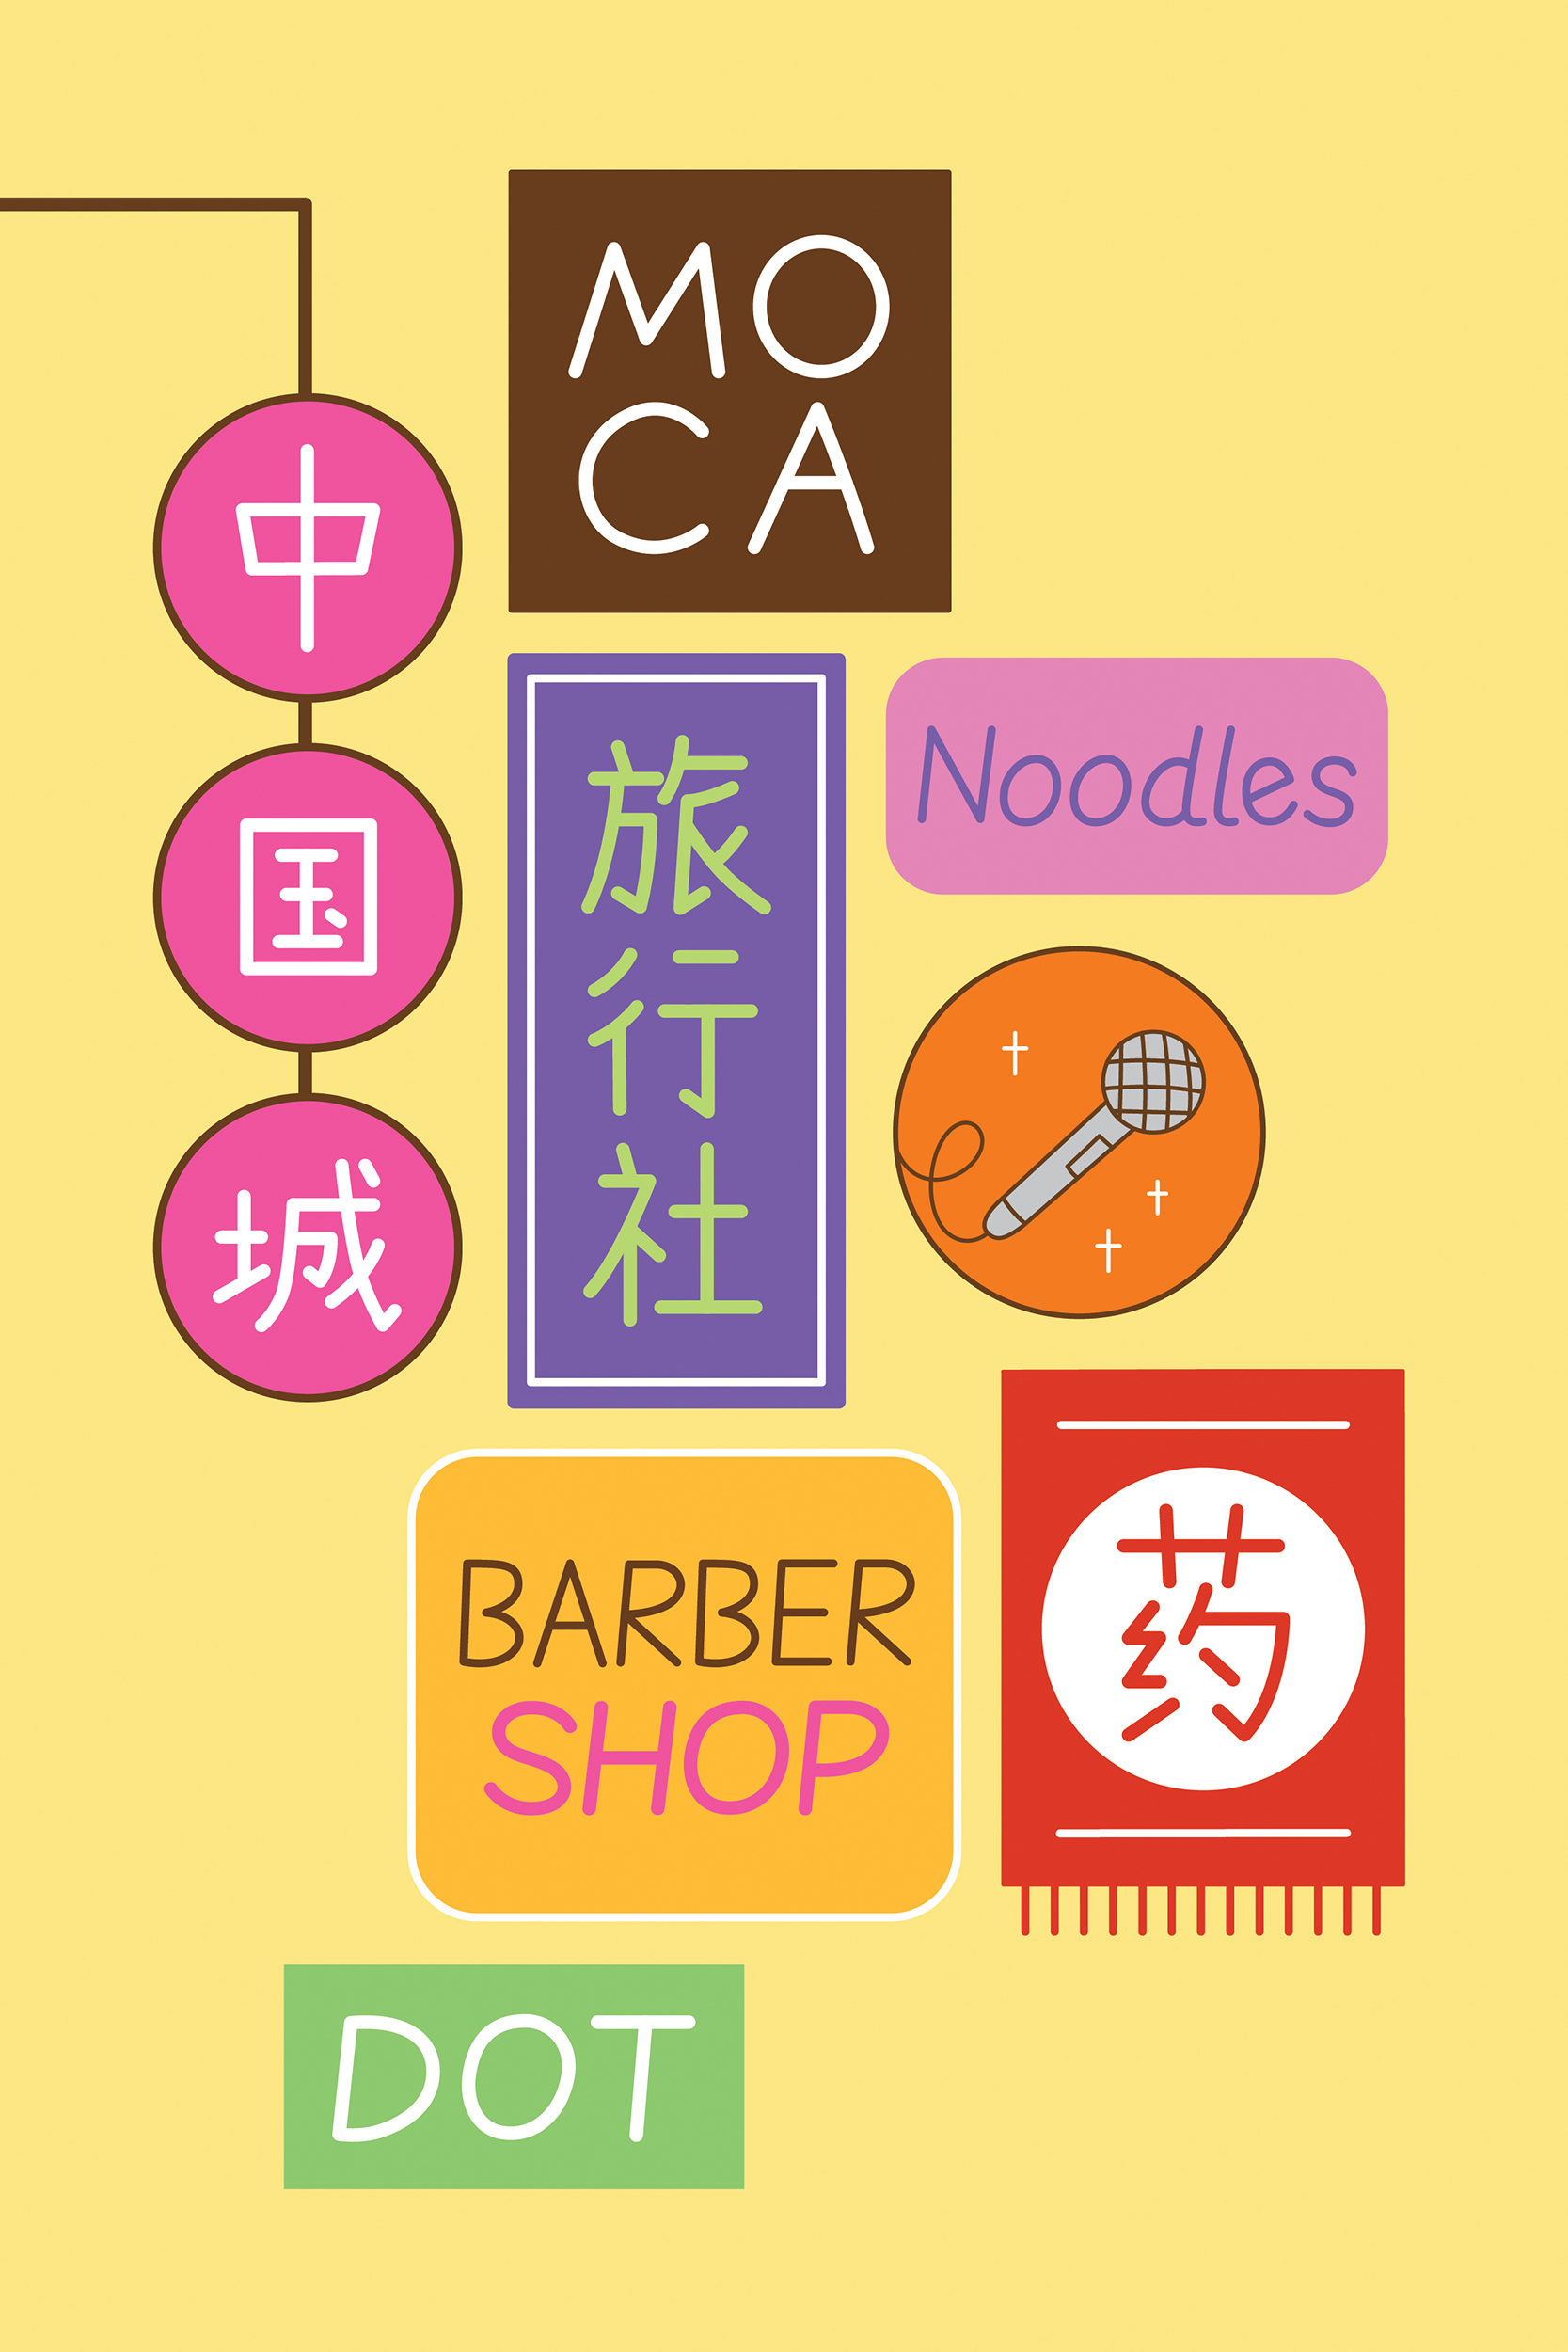 Gateways to Chinatown 0630-38.jpg